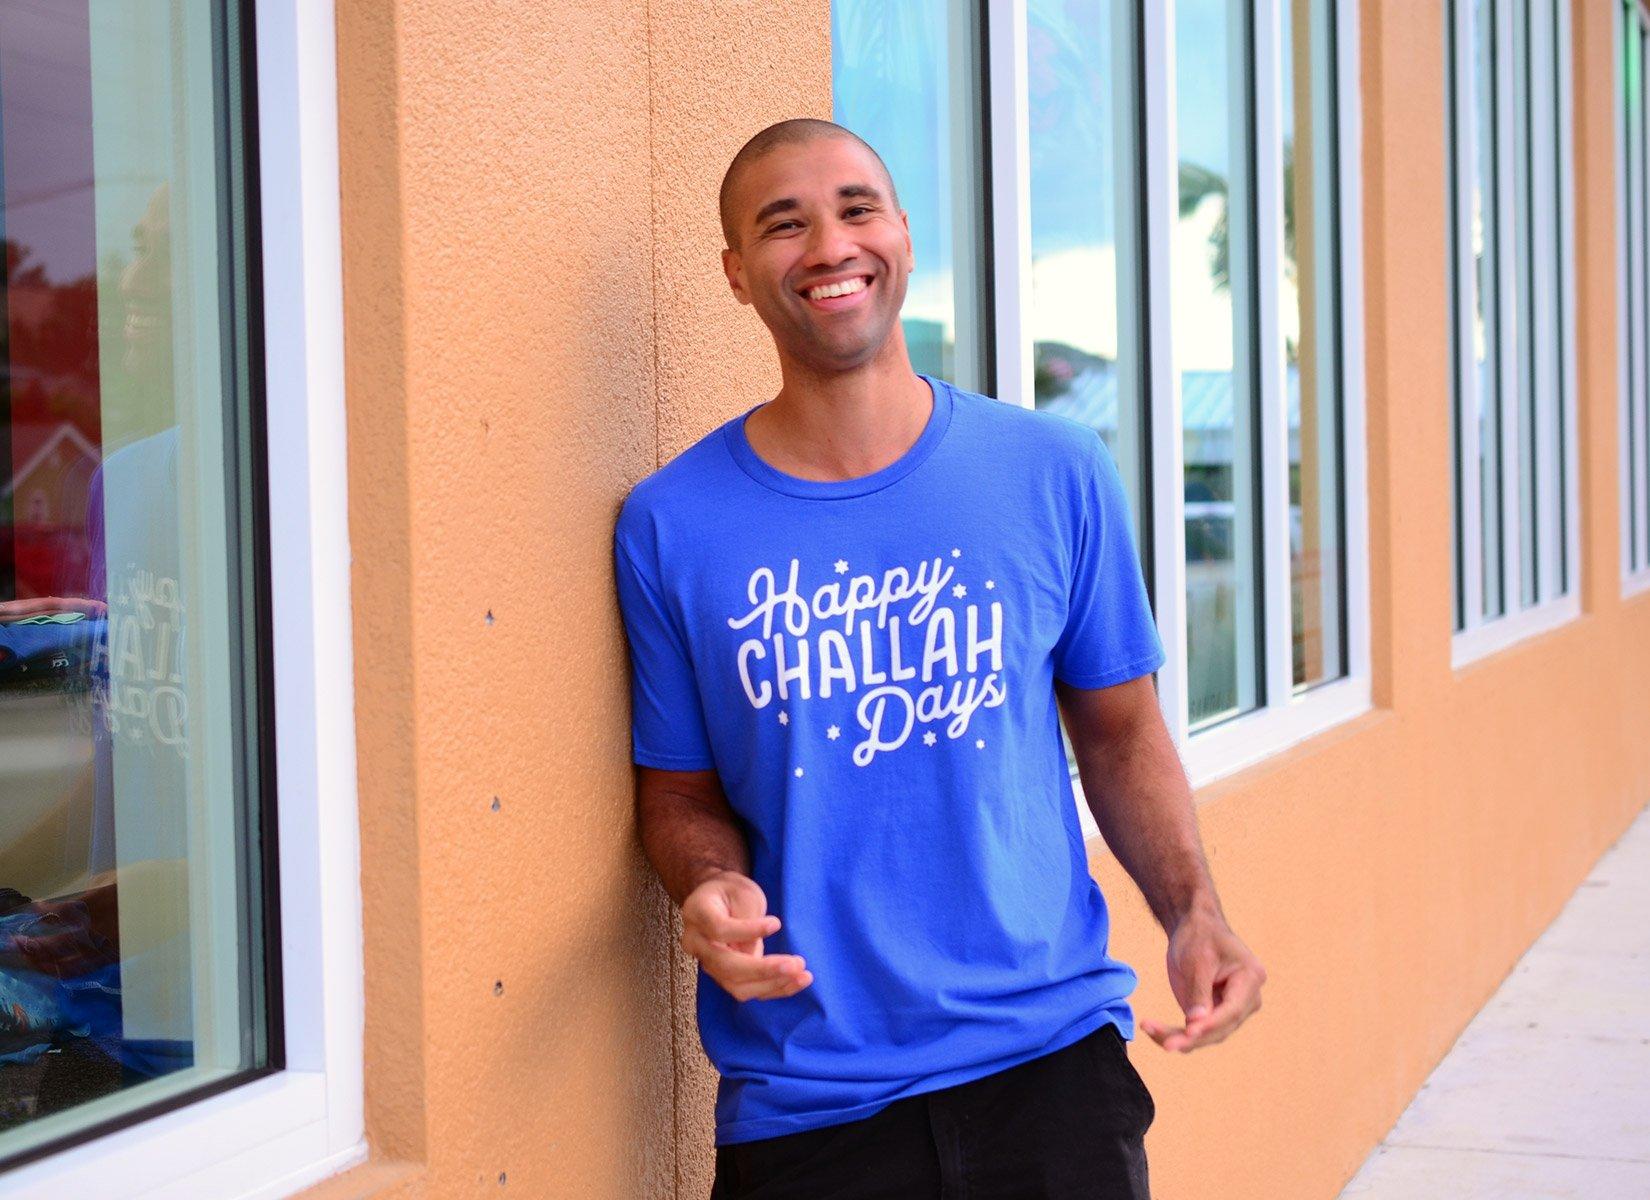 Happy Challah Days on Mens T-Shirt